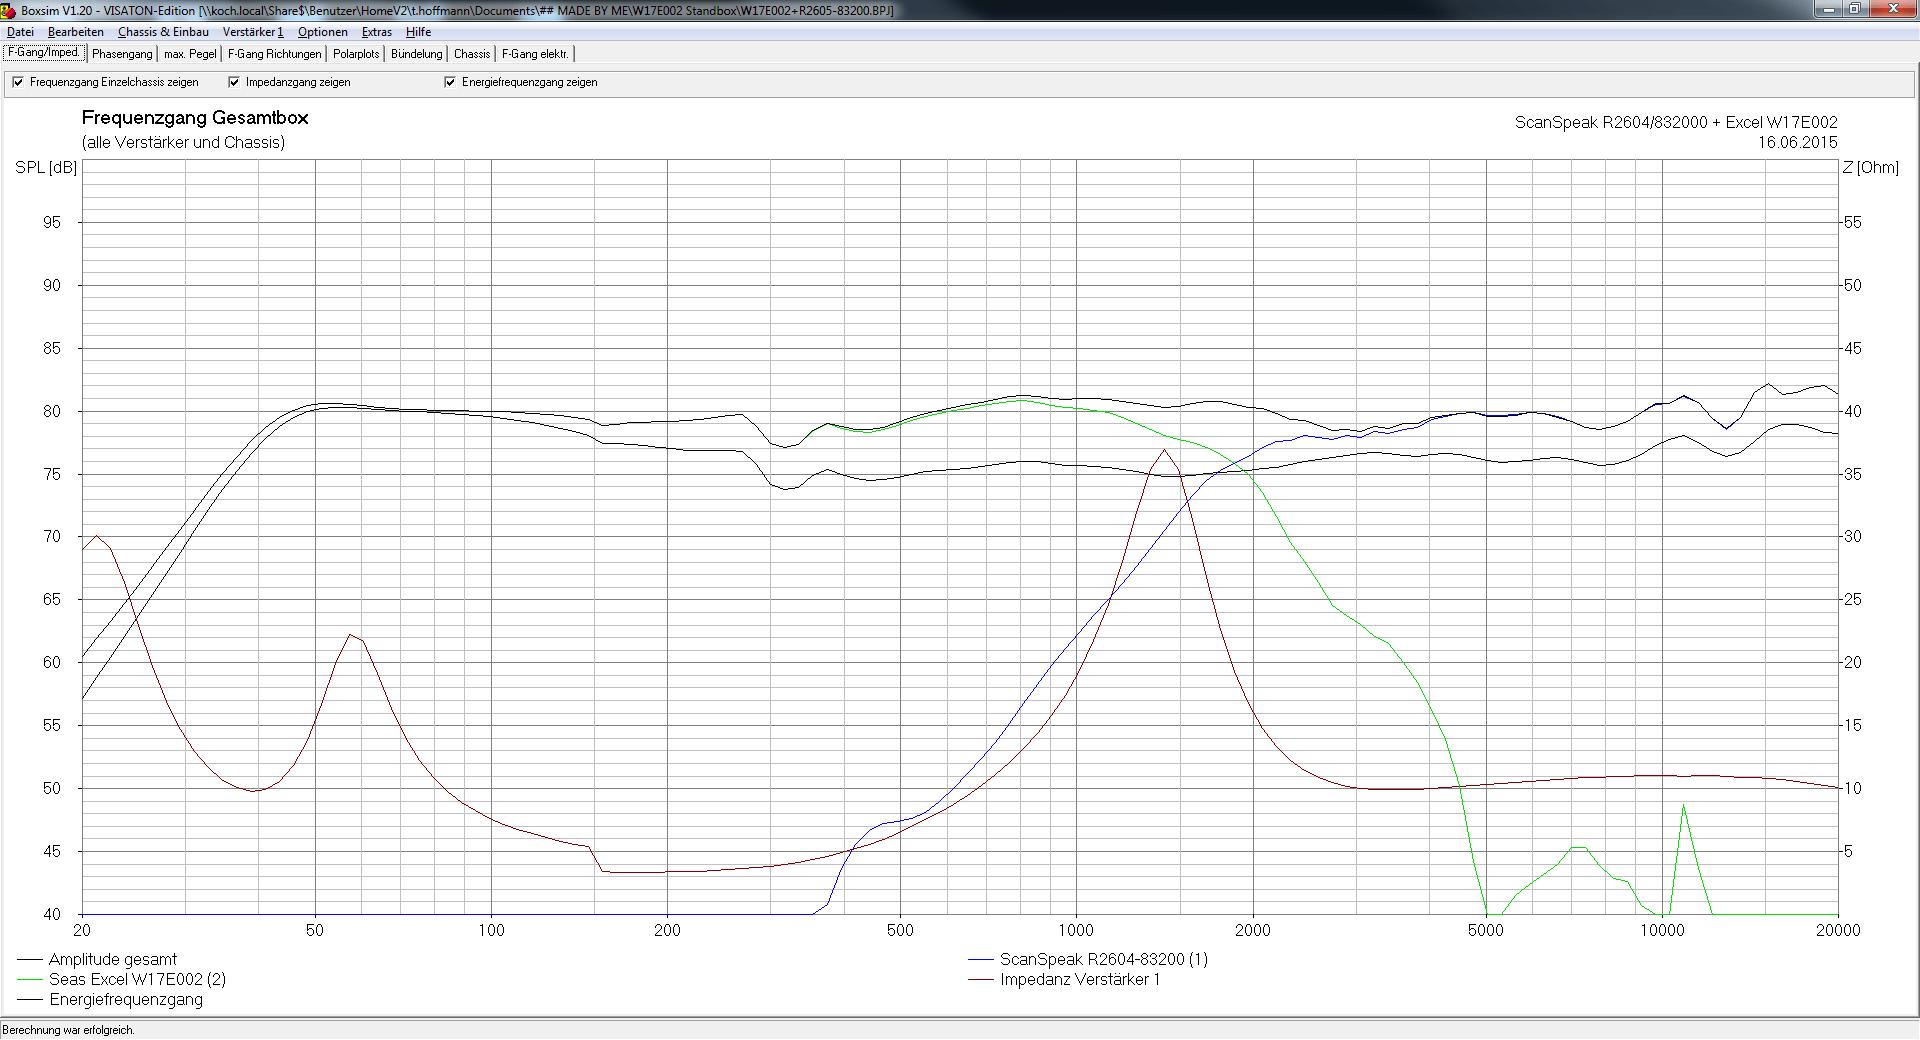 Projekt Fur Excel W17 E002